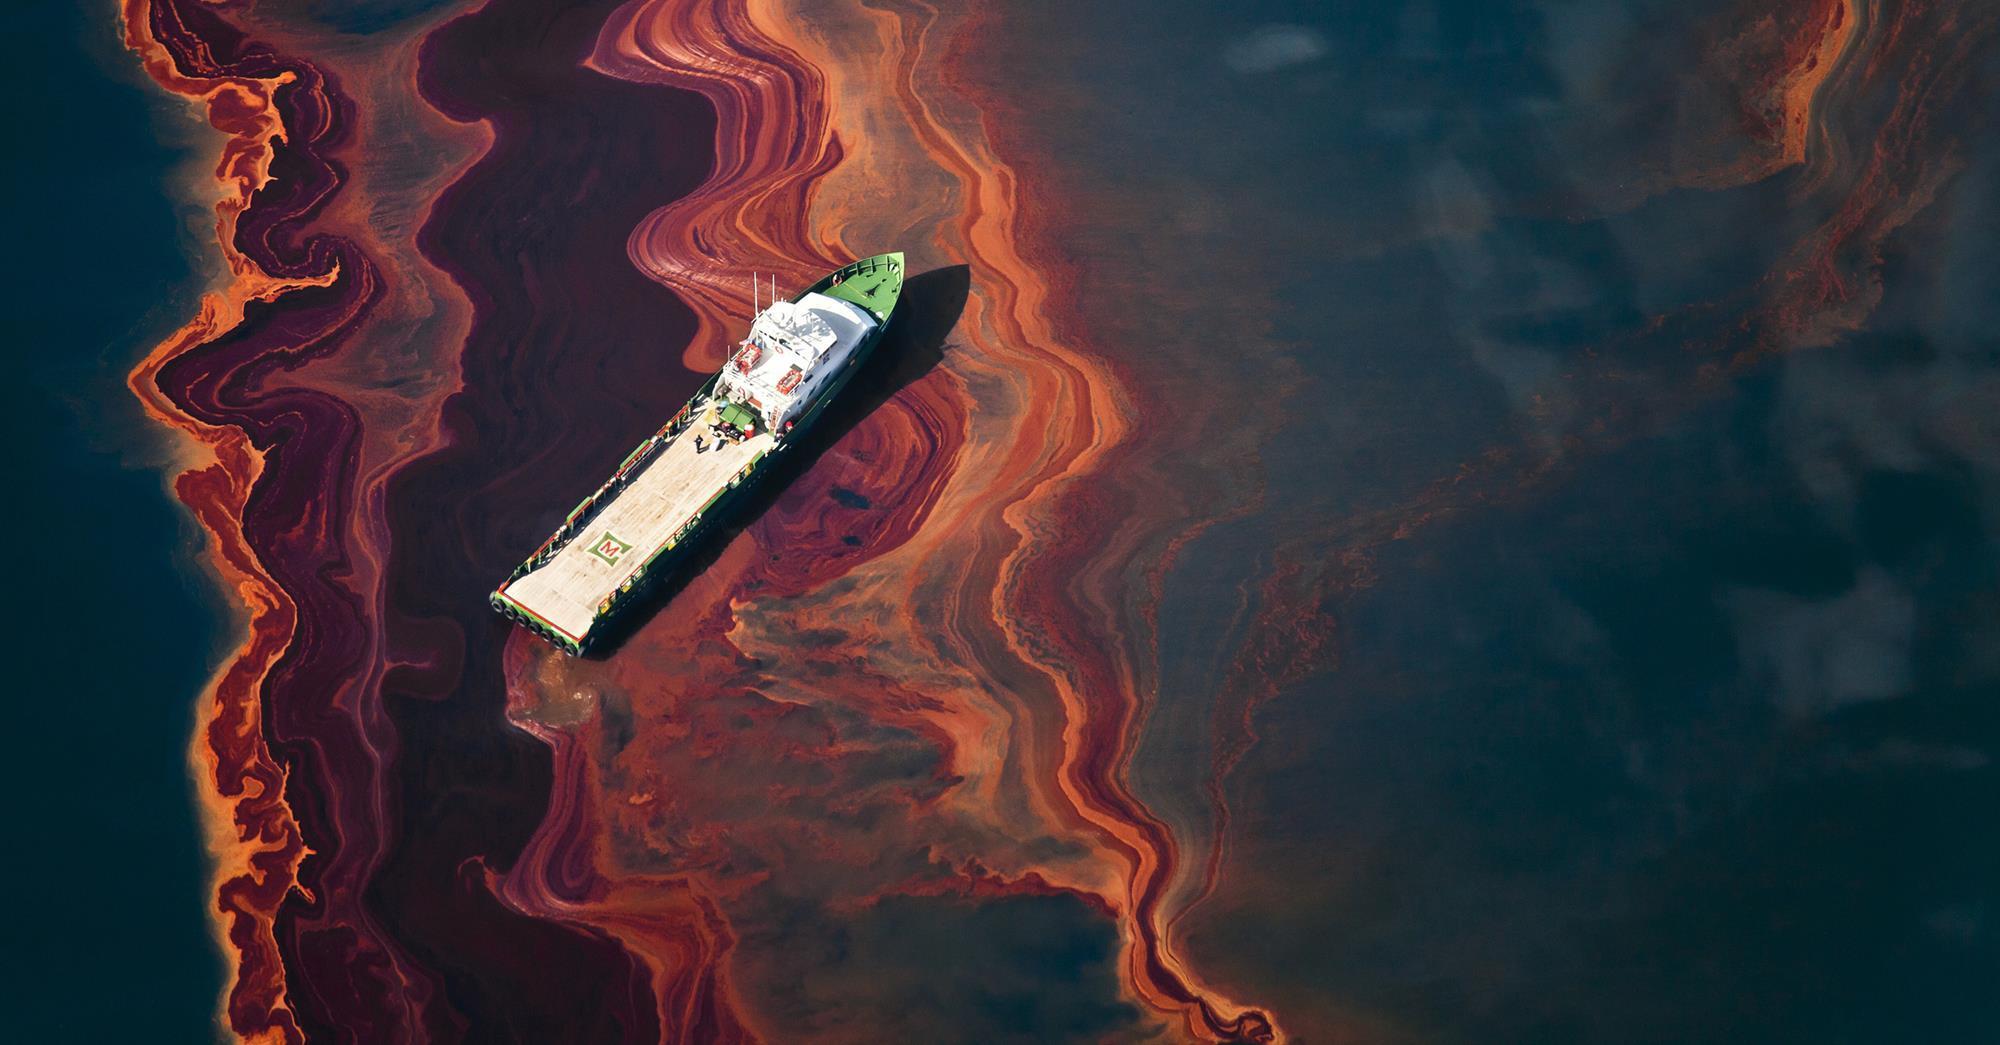 Hasil gambar untuk oil spill